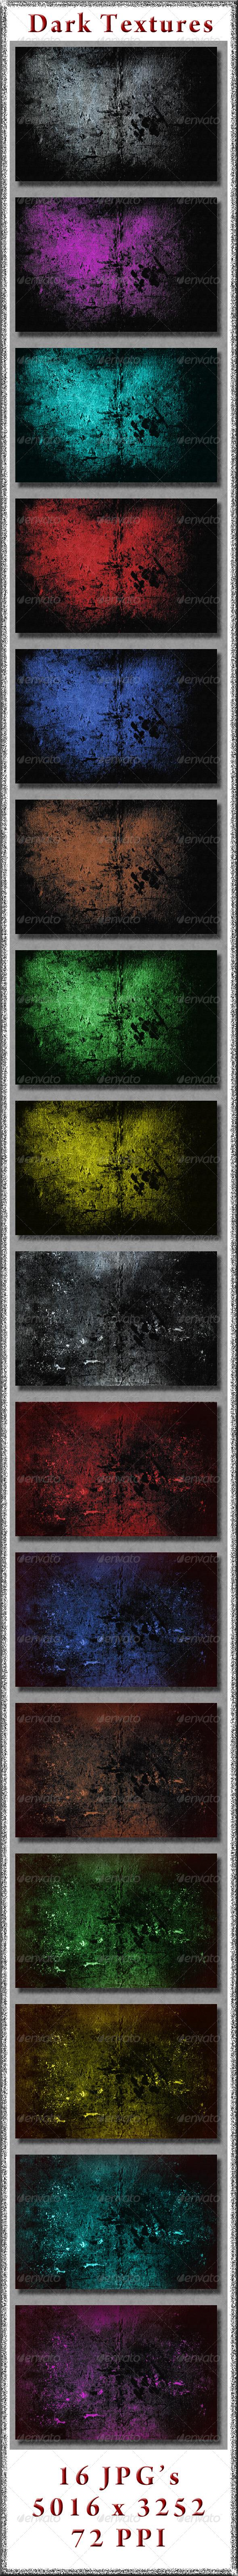 GraphicRiver Dark Textures 4148629